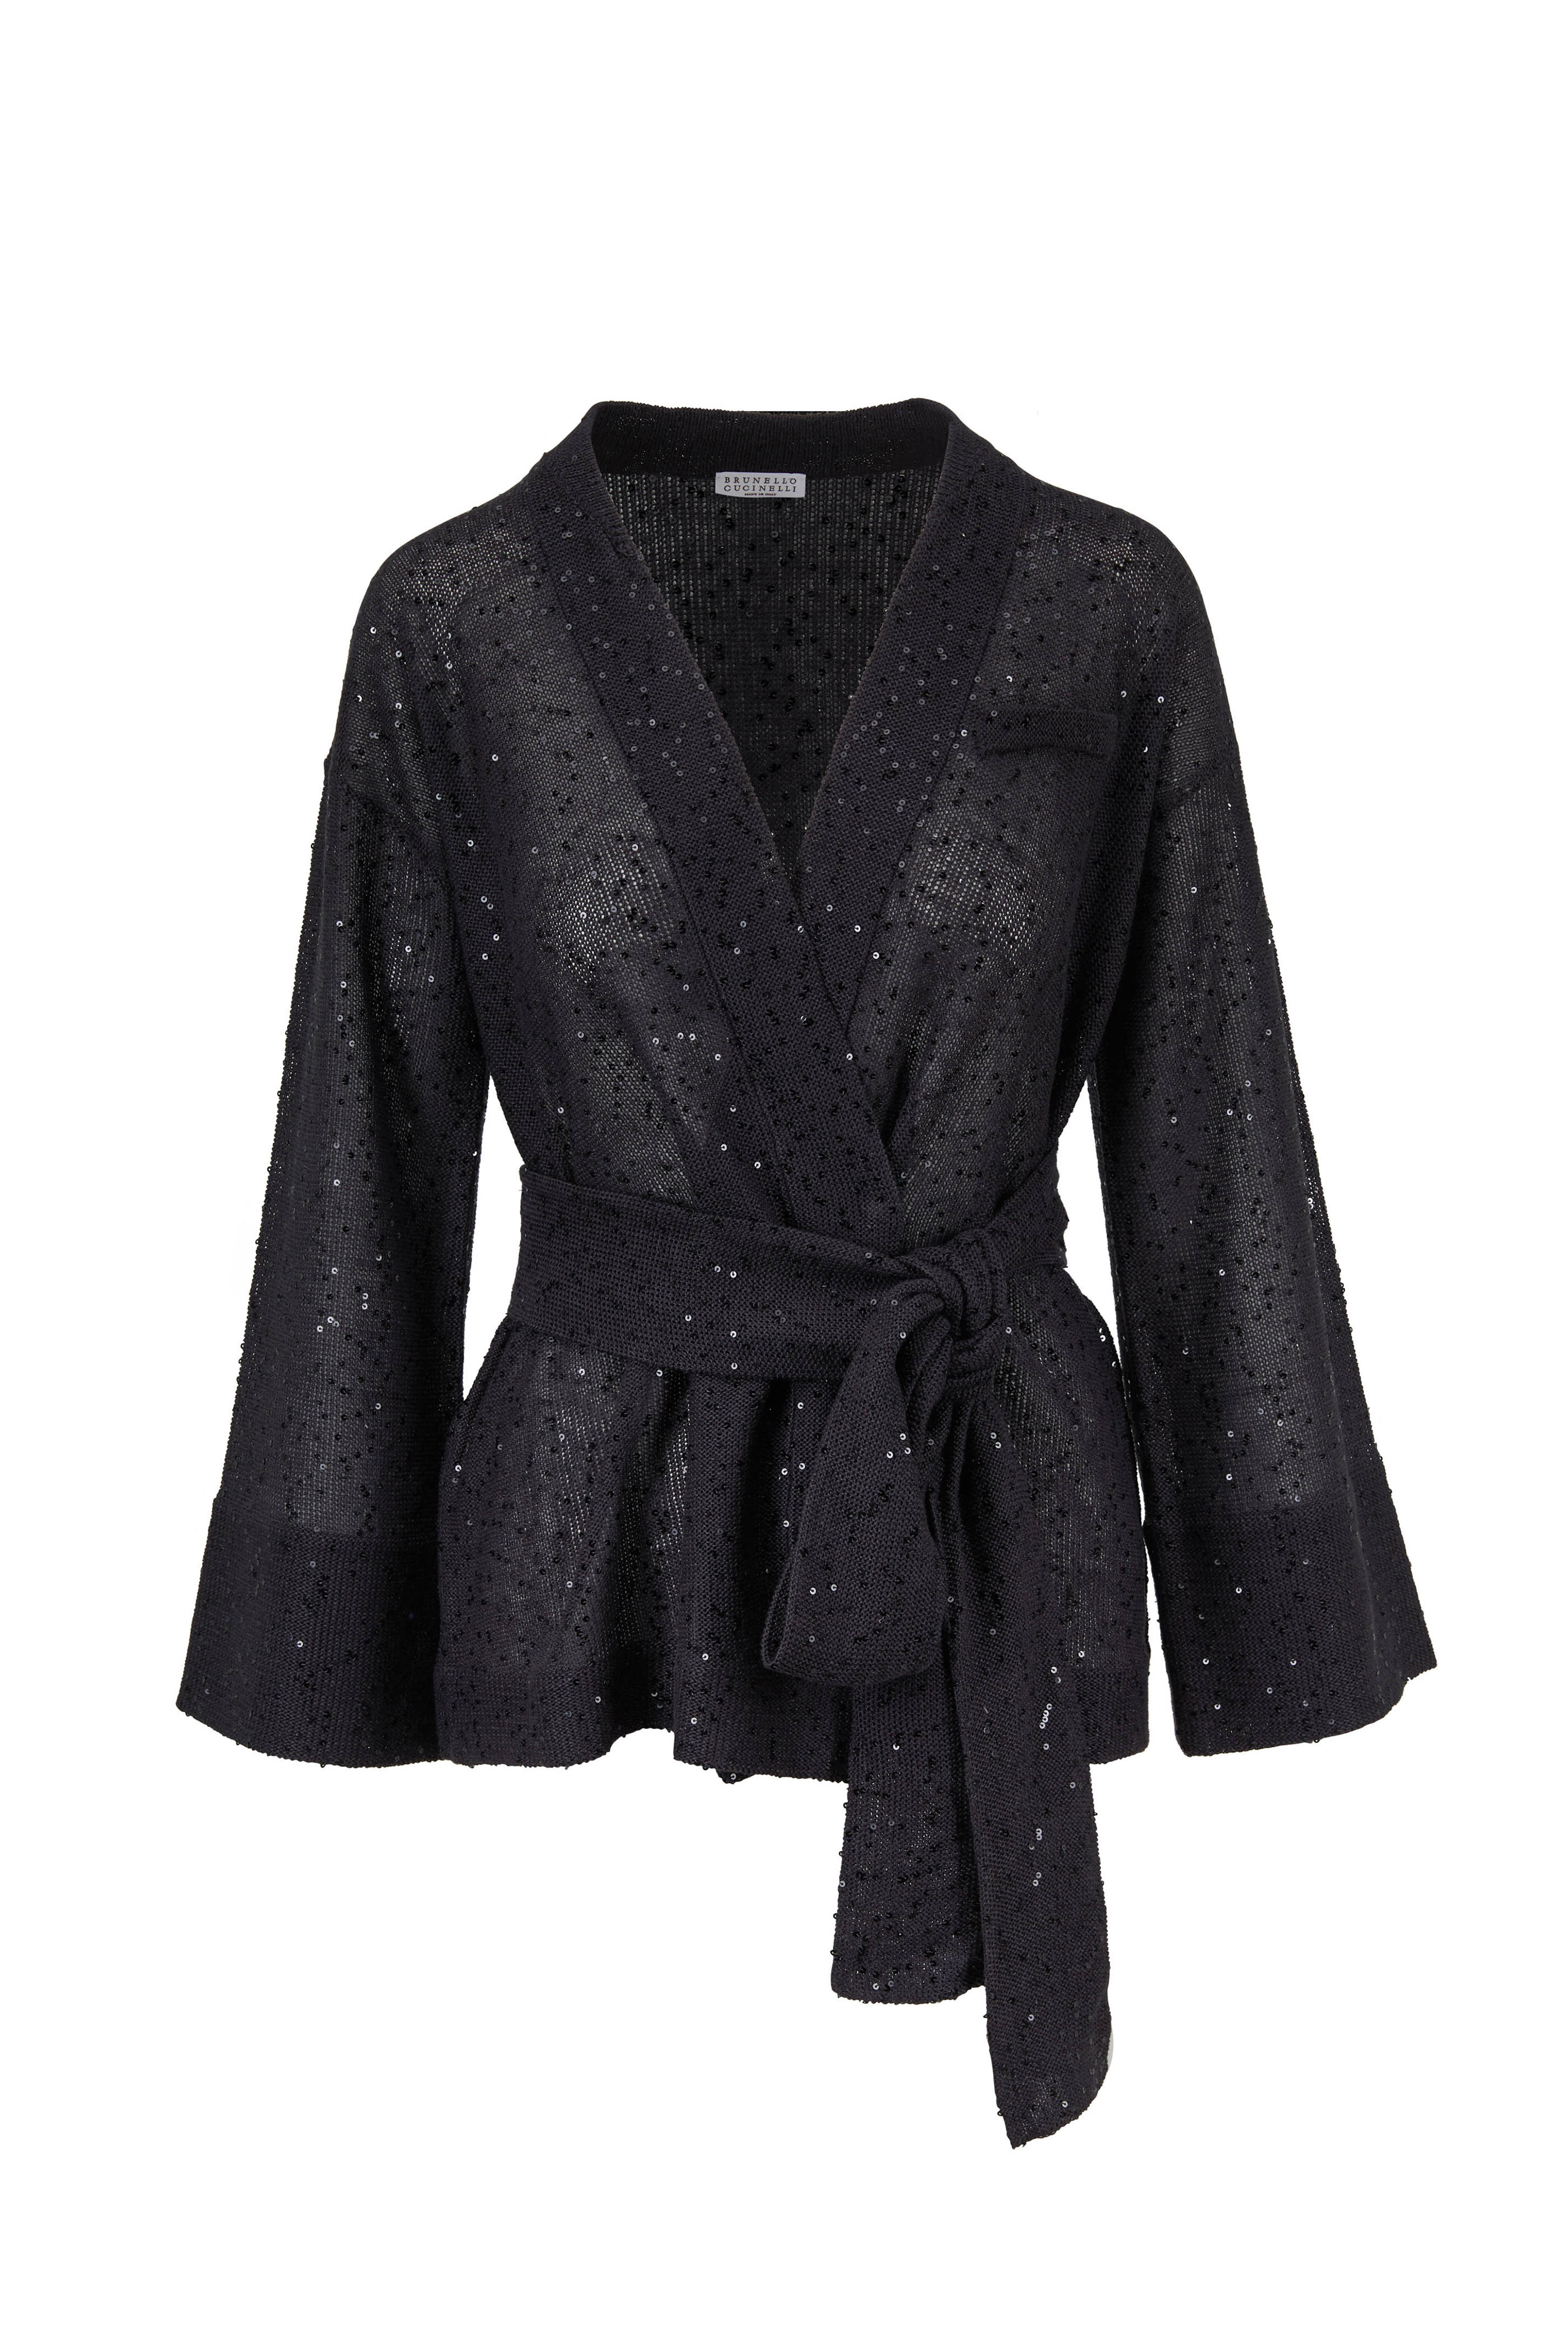 b2766735dc Brunello Cucinelli - Onyx Linen & Silk Paillette Wrap Cardigan ...